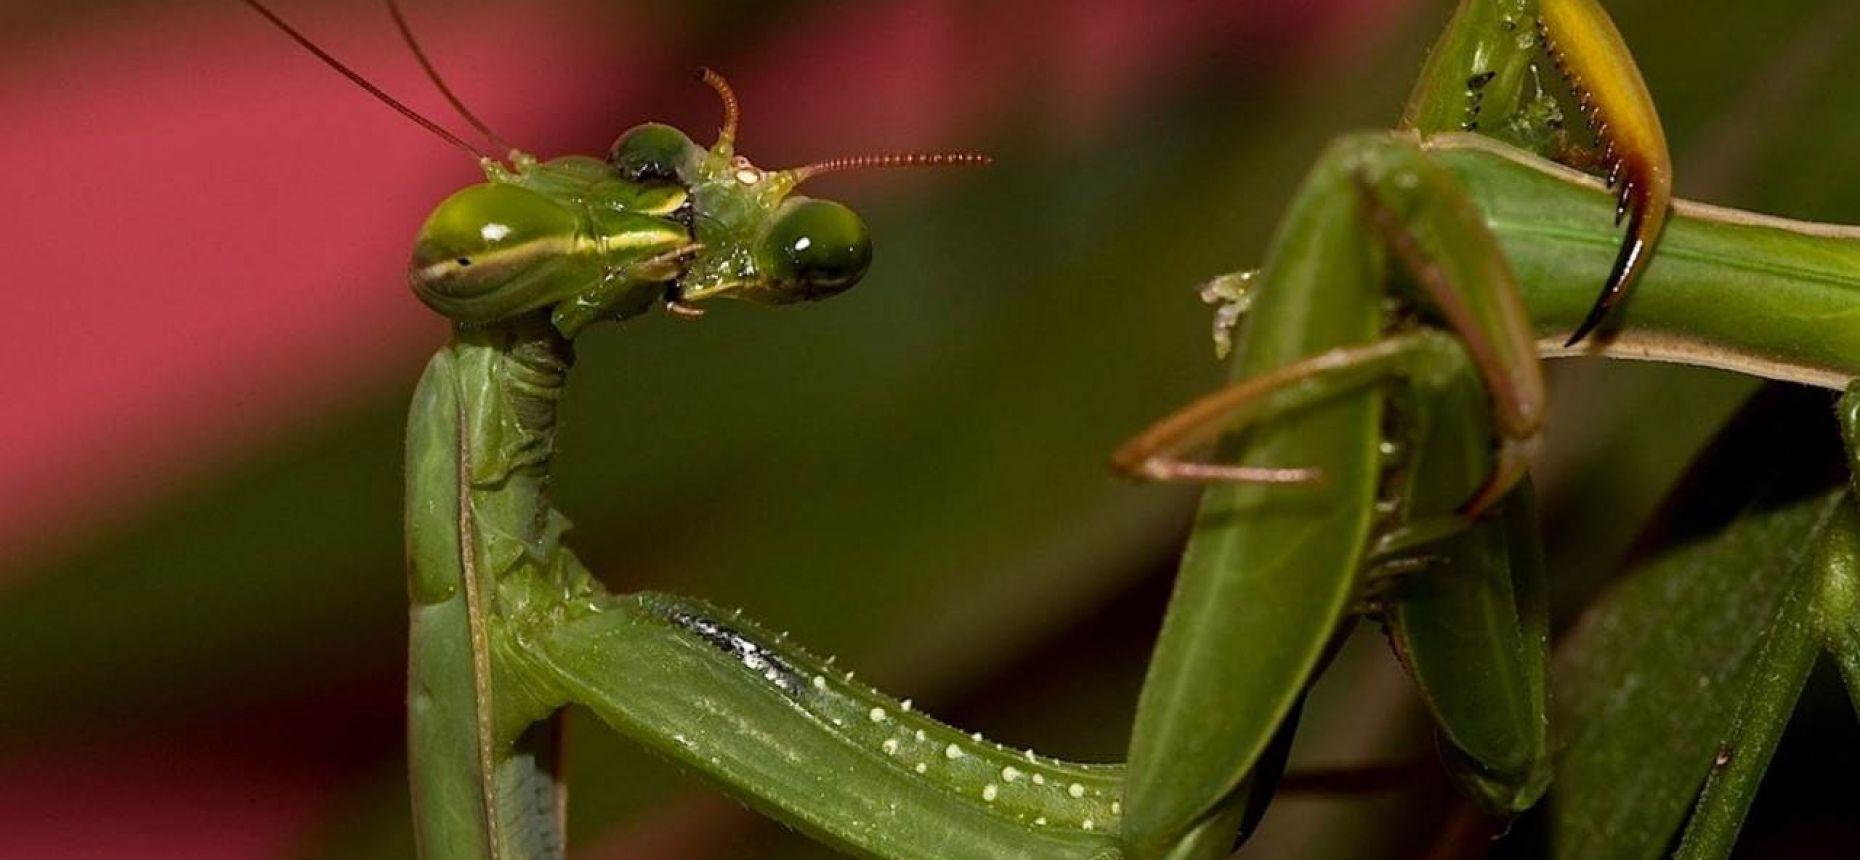 Самка богомола откусывает голову самца